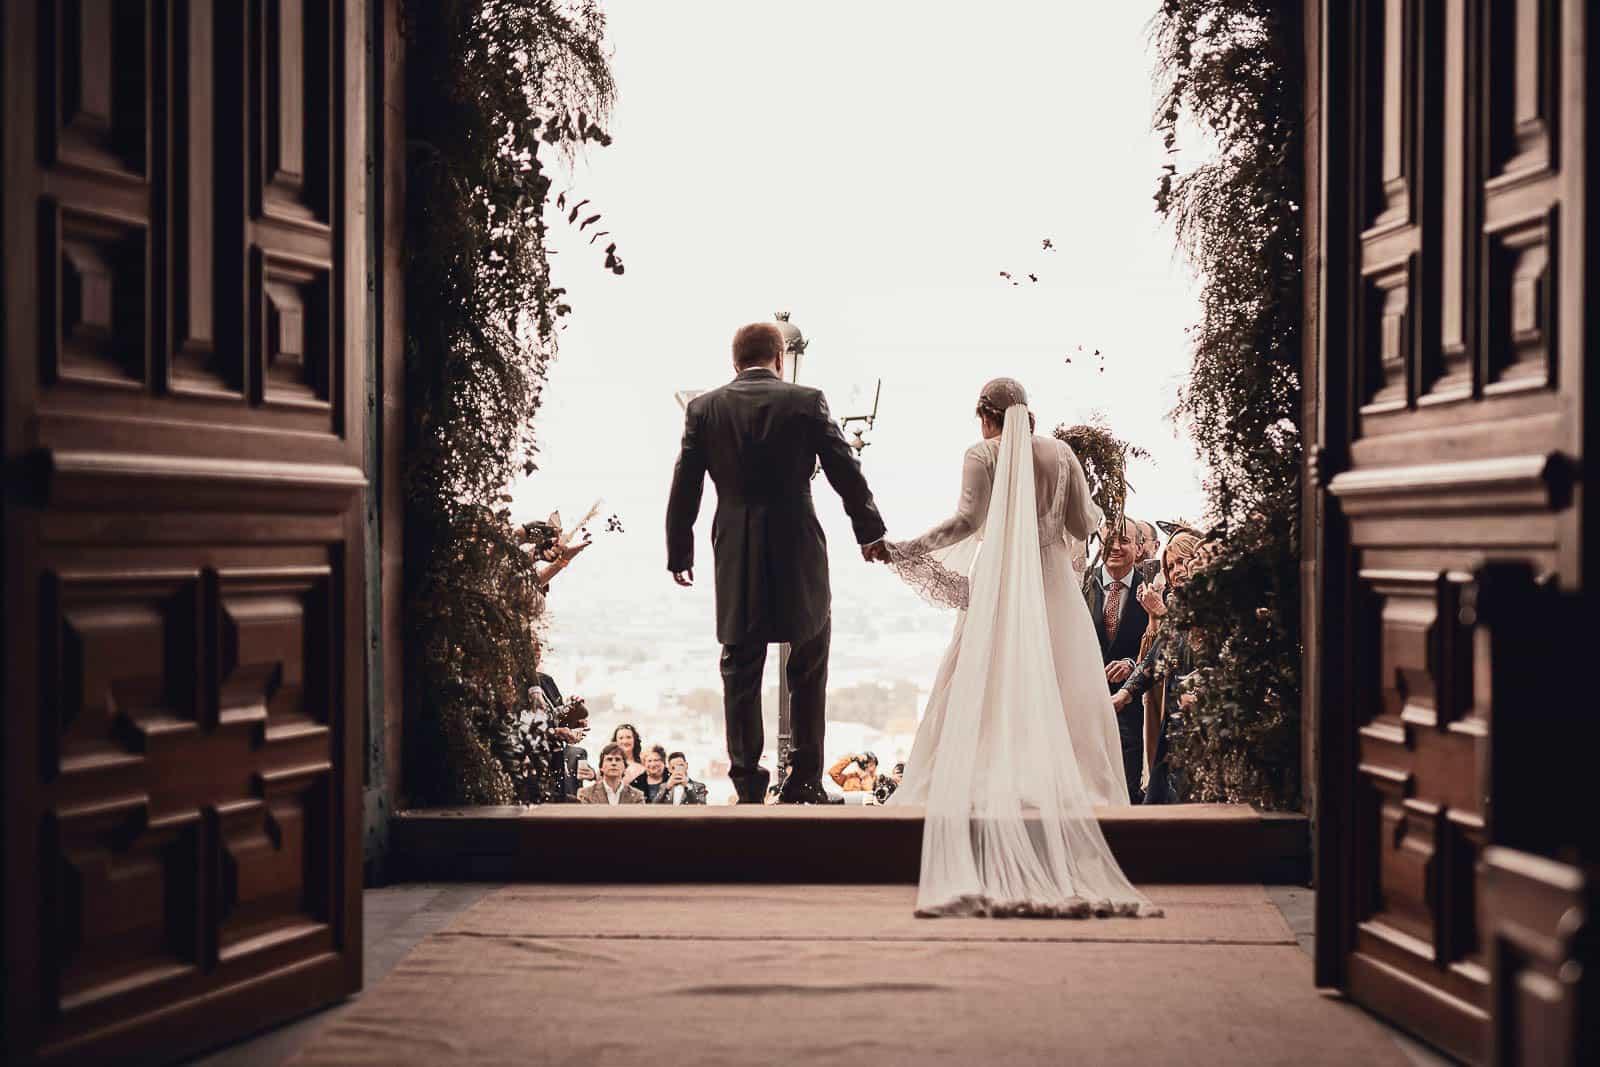 iglesia novios casados arroz salida velo cola